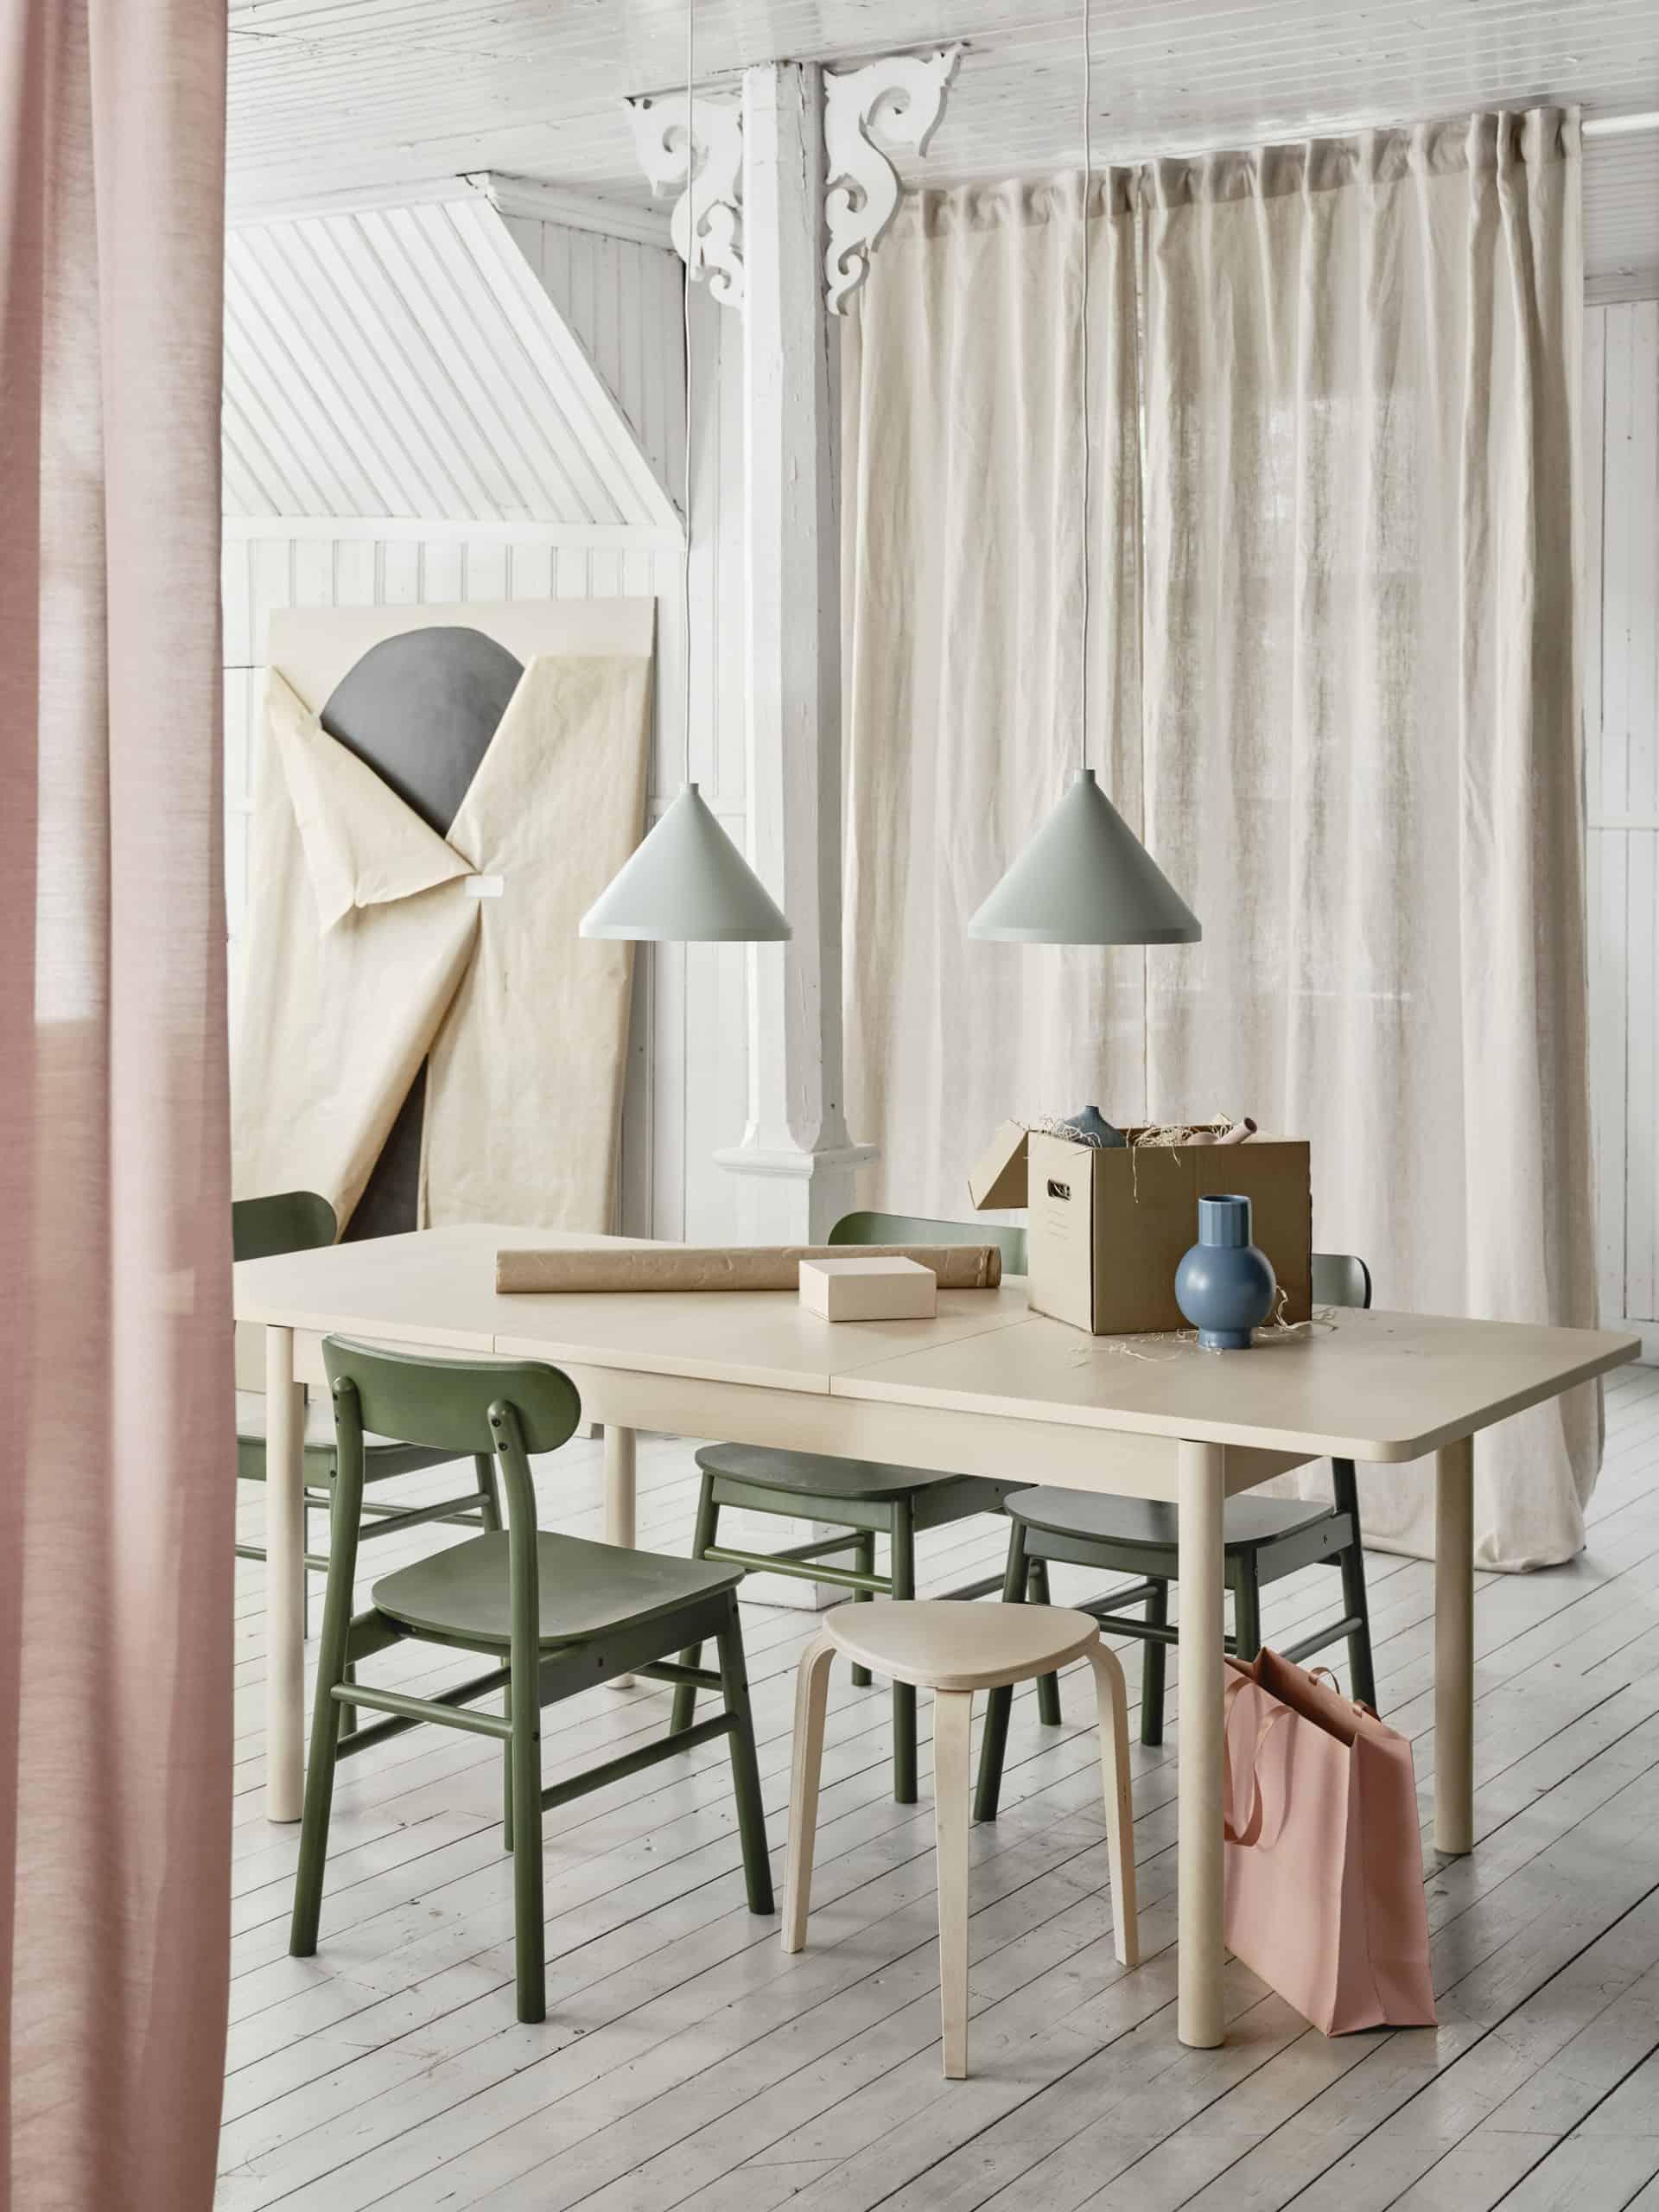 IKEA_RONNINGE_bord_PH170245